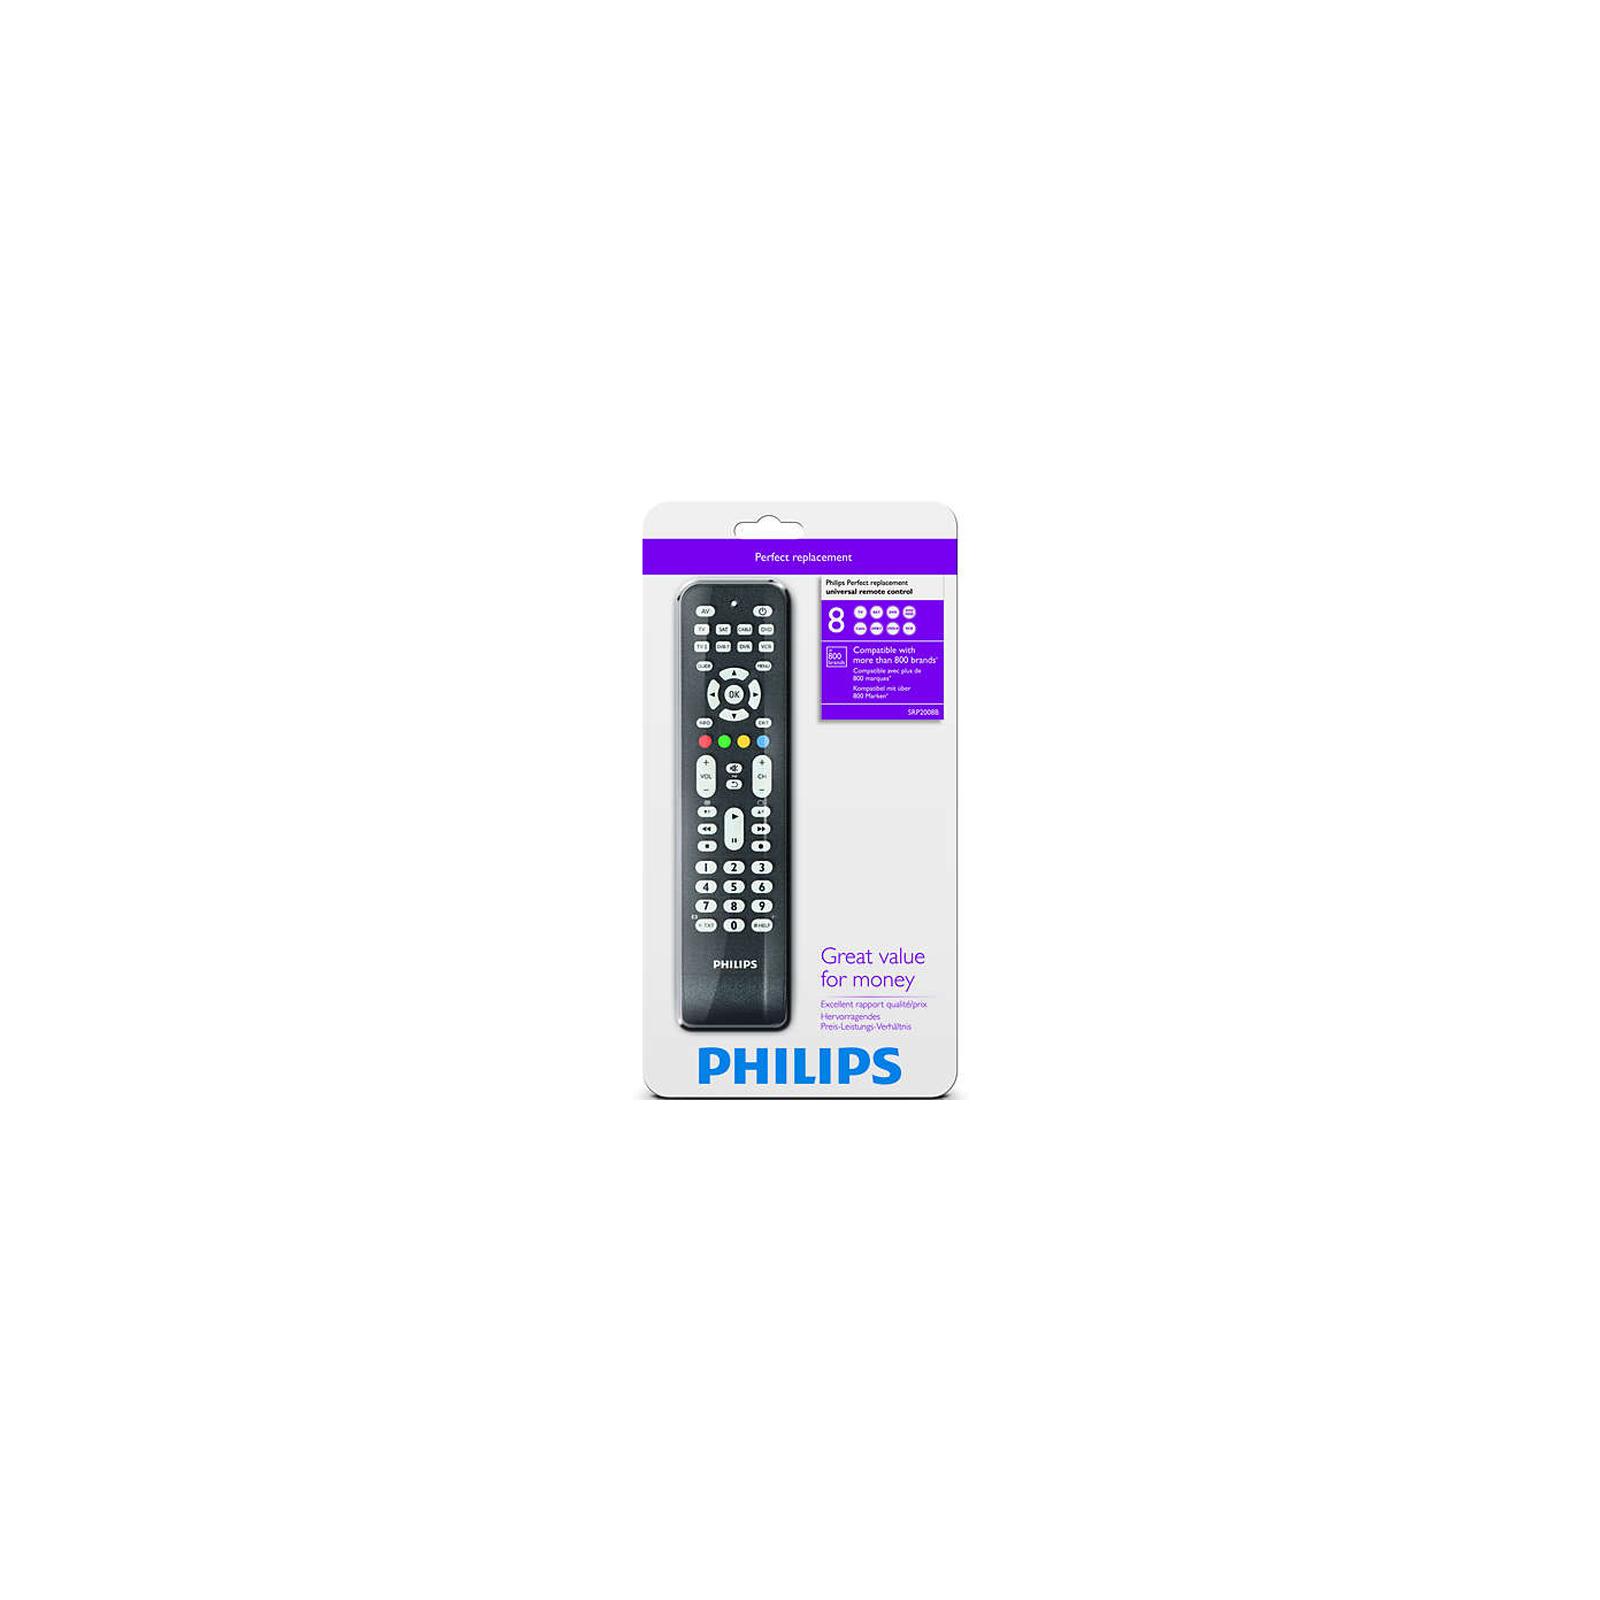 Пульт ДУ для телевизора PHILIPS SRP2008B (SRP2008B/86) изображение 4